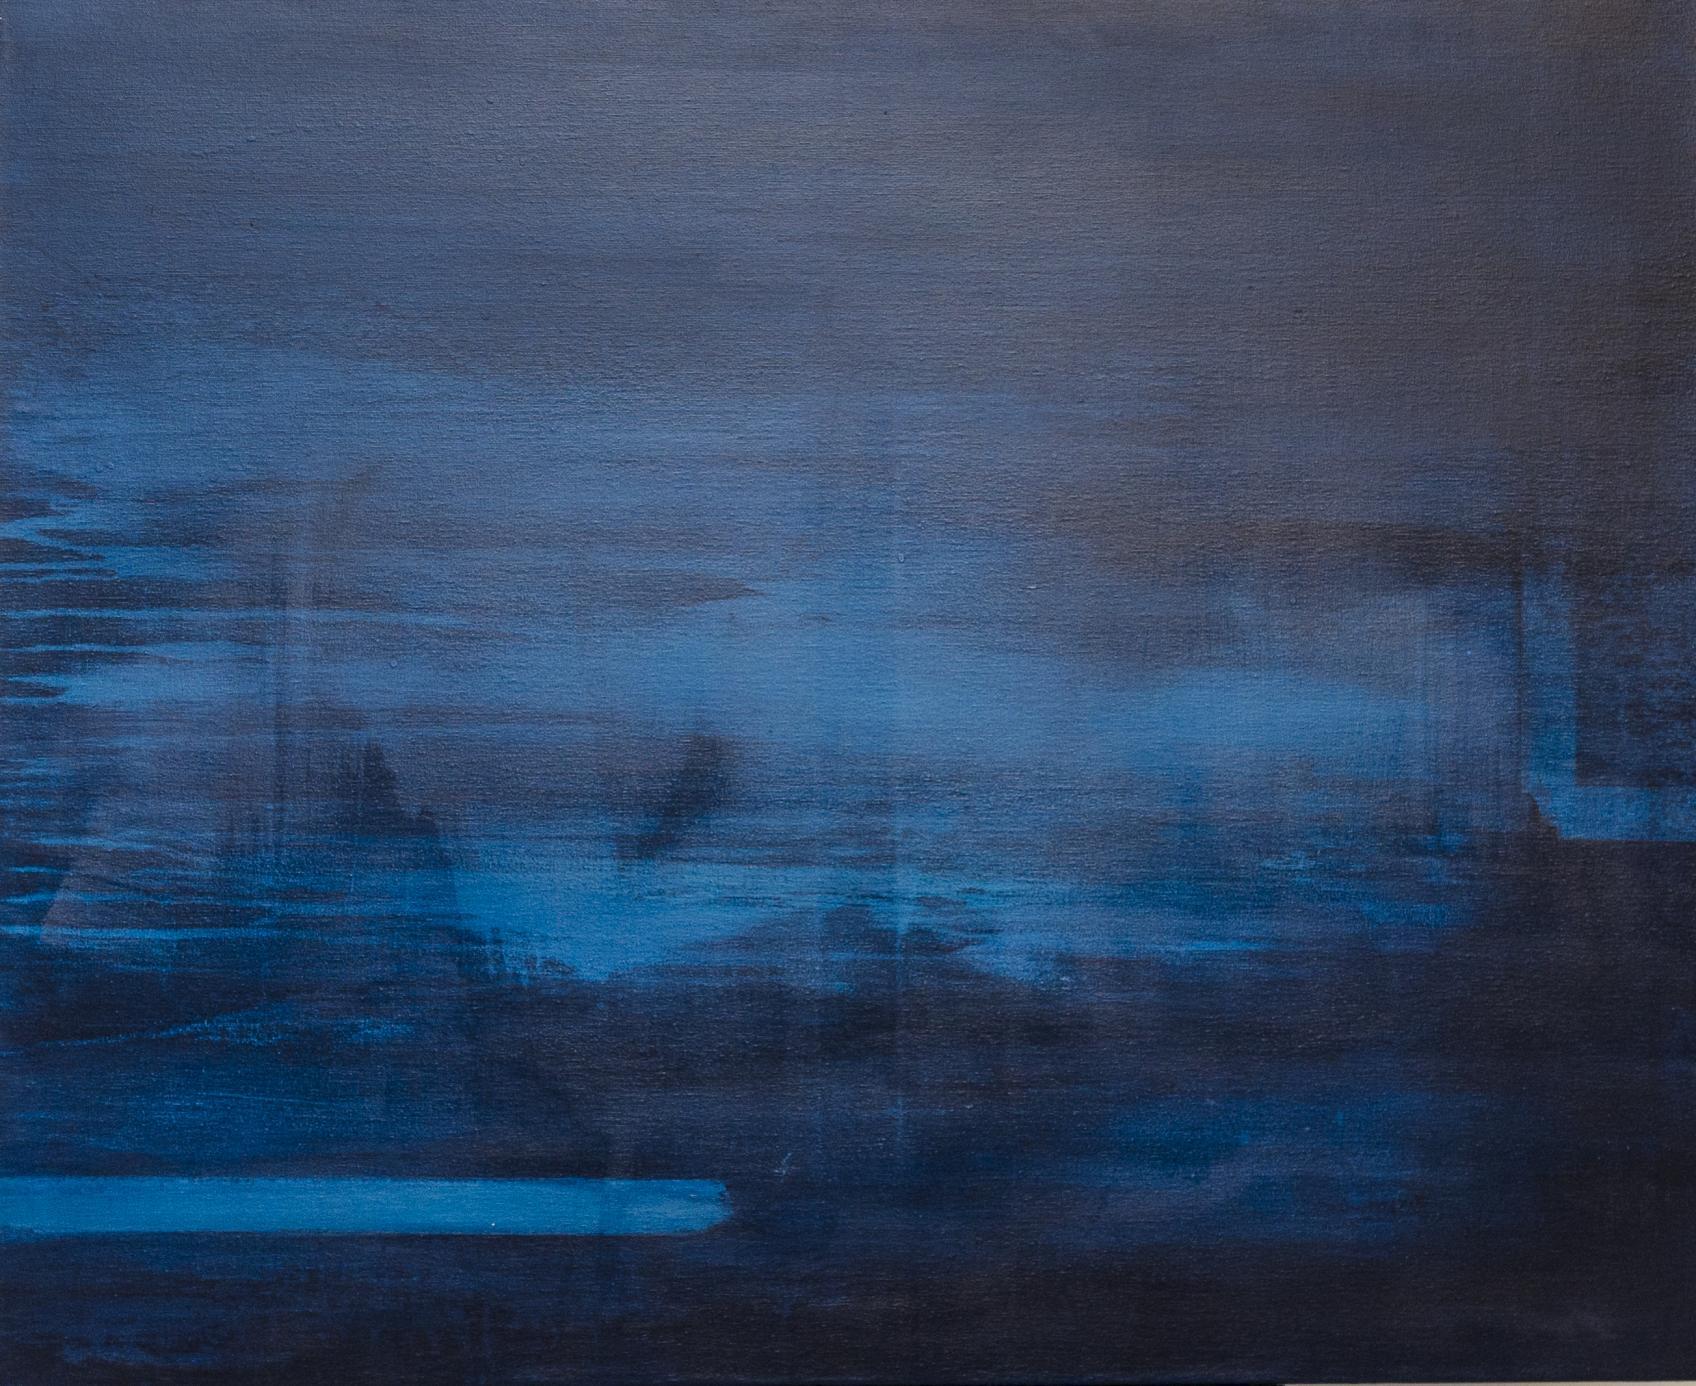 ANTONIO (2017) - Isabel Fuster